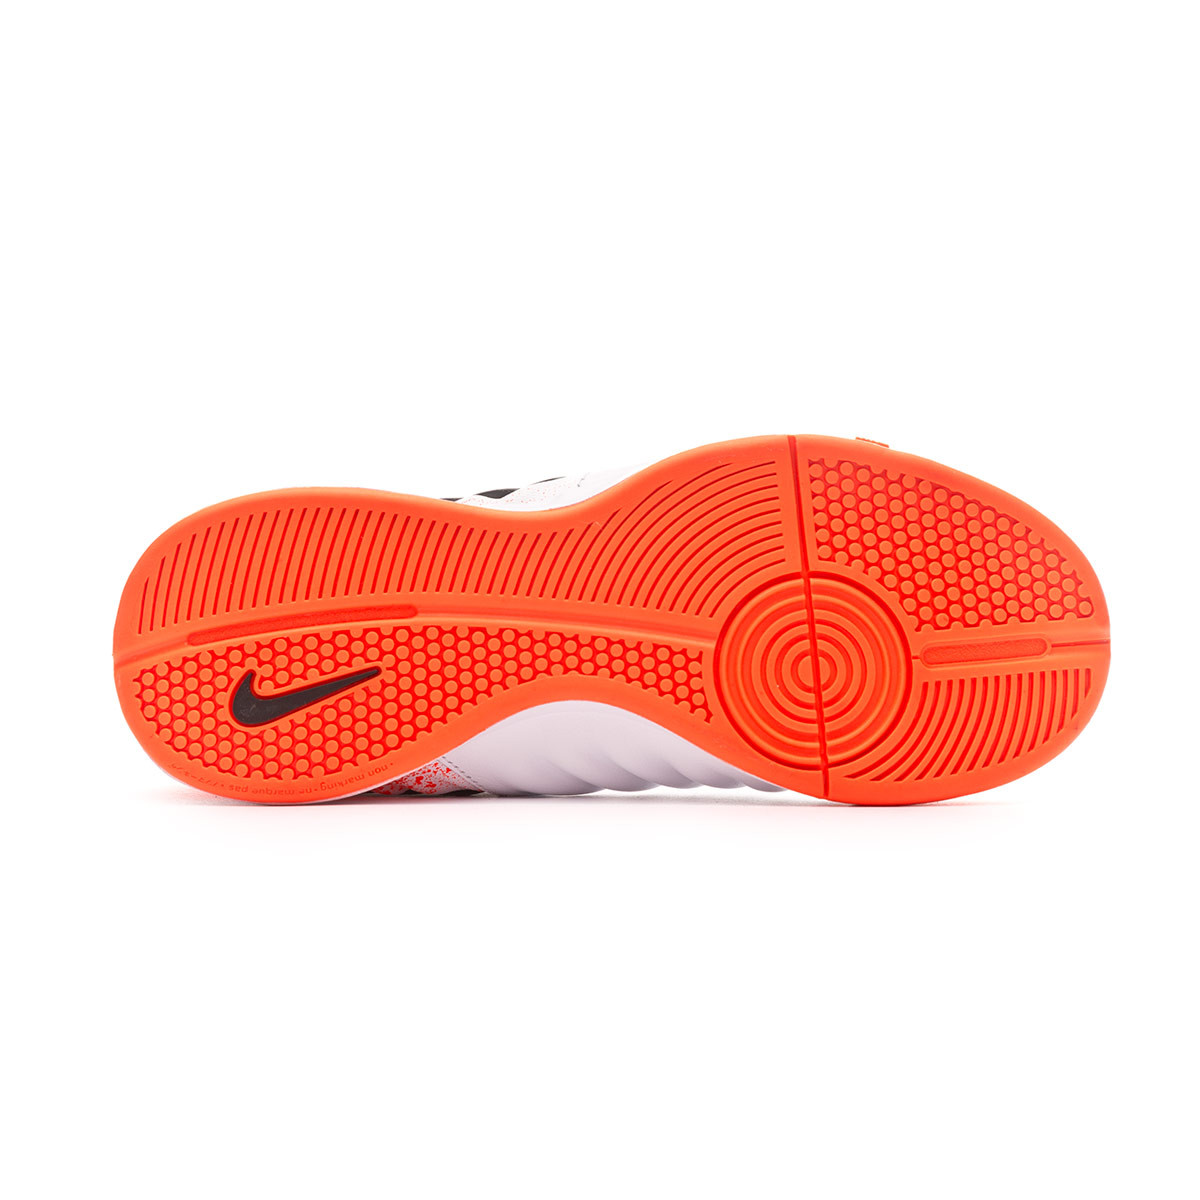 629cc054abd Futsal Boot Nike Tiempo LegendX VII Academy IC Niño White-Black-Hyper  crimson - Tienda de fútbol Fútbol Emotion